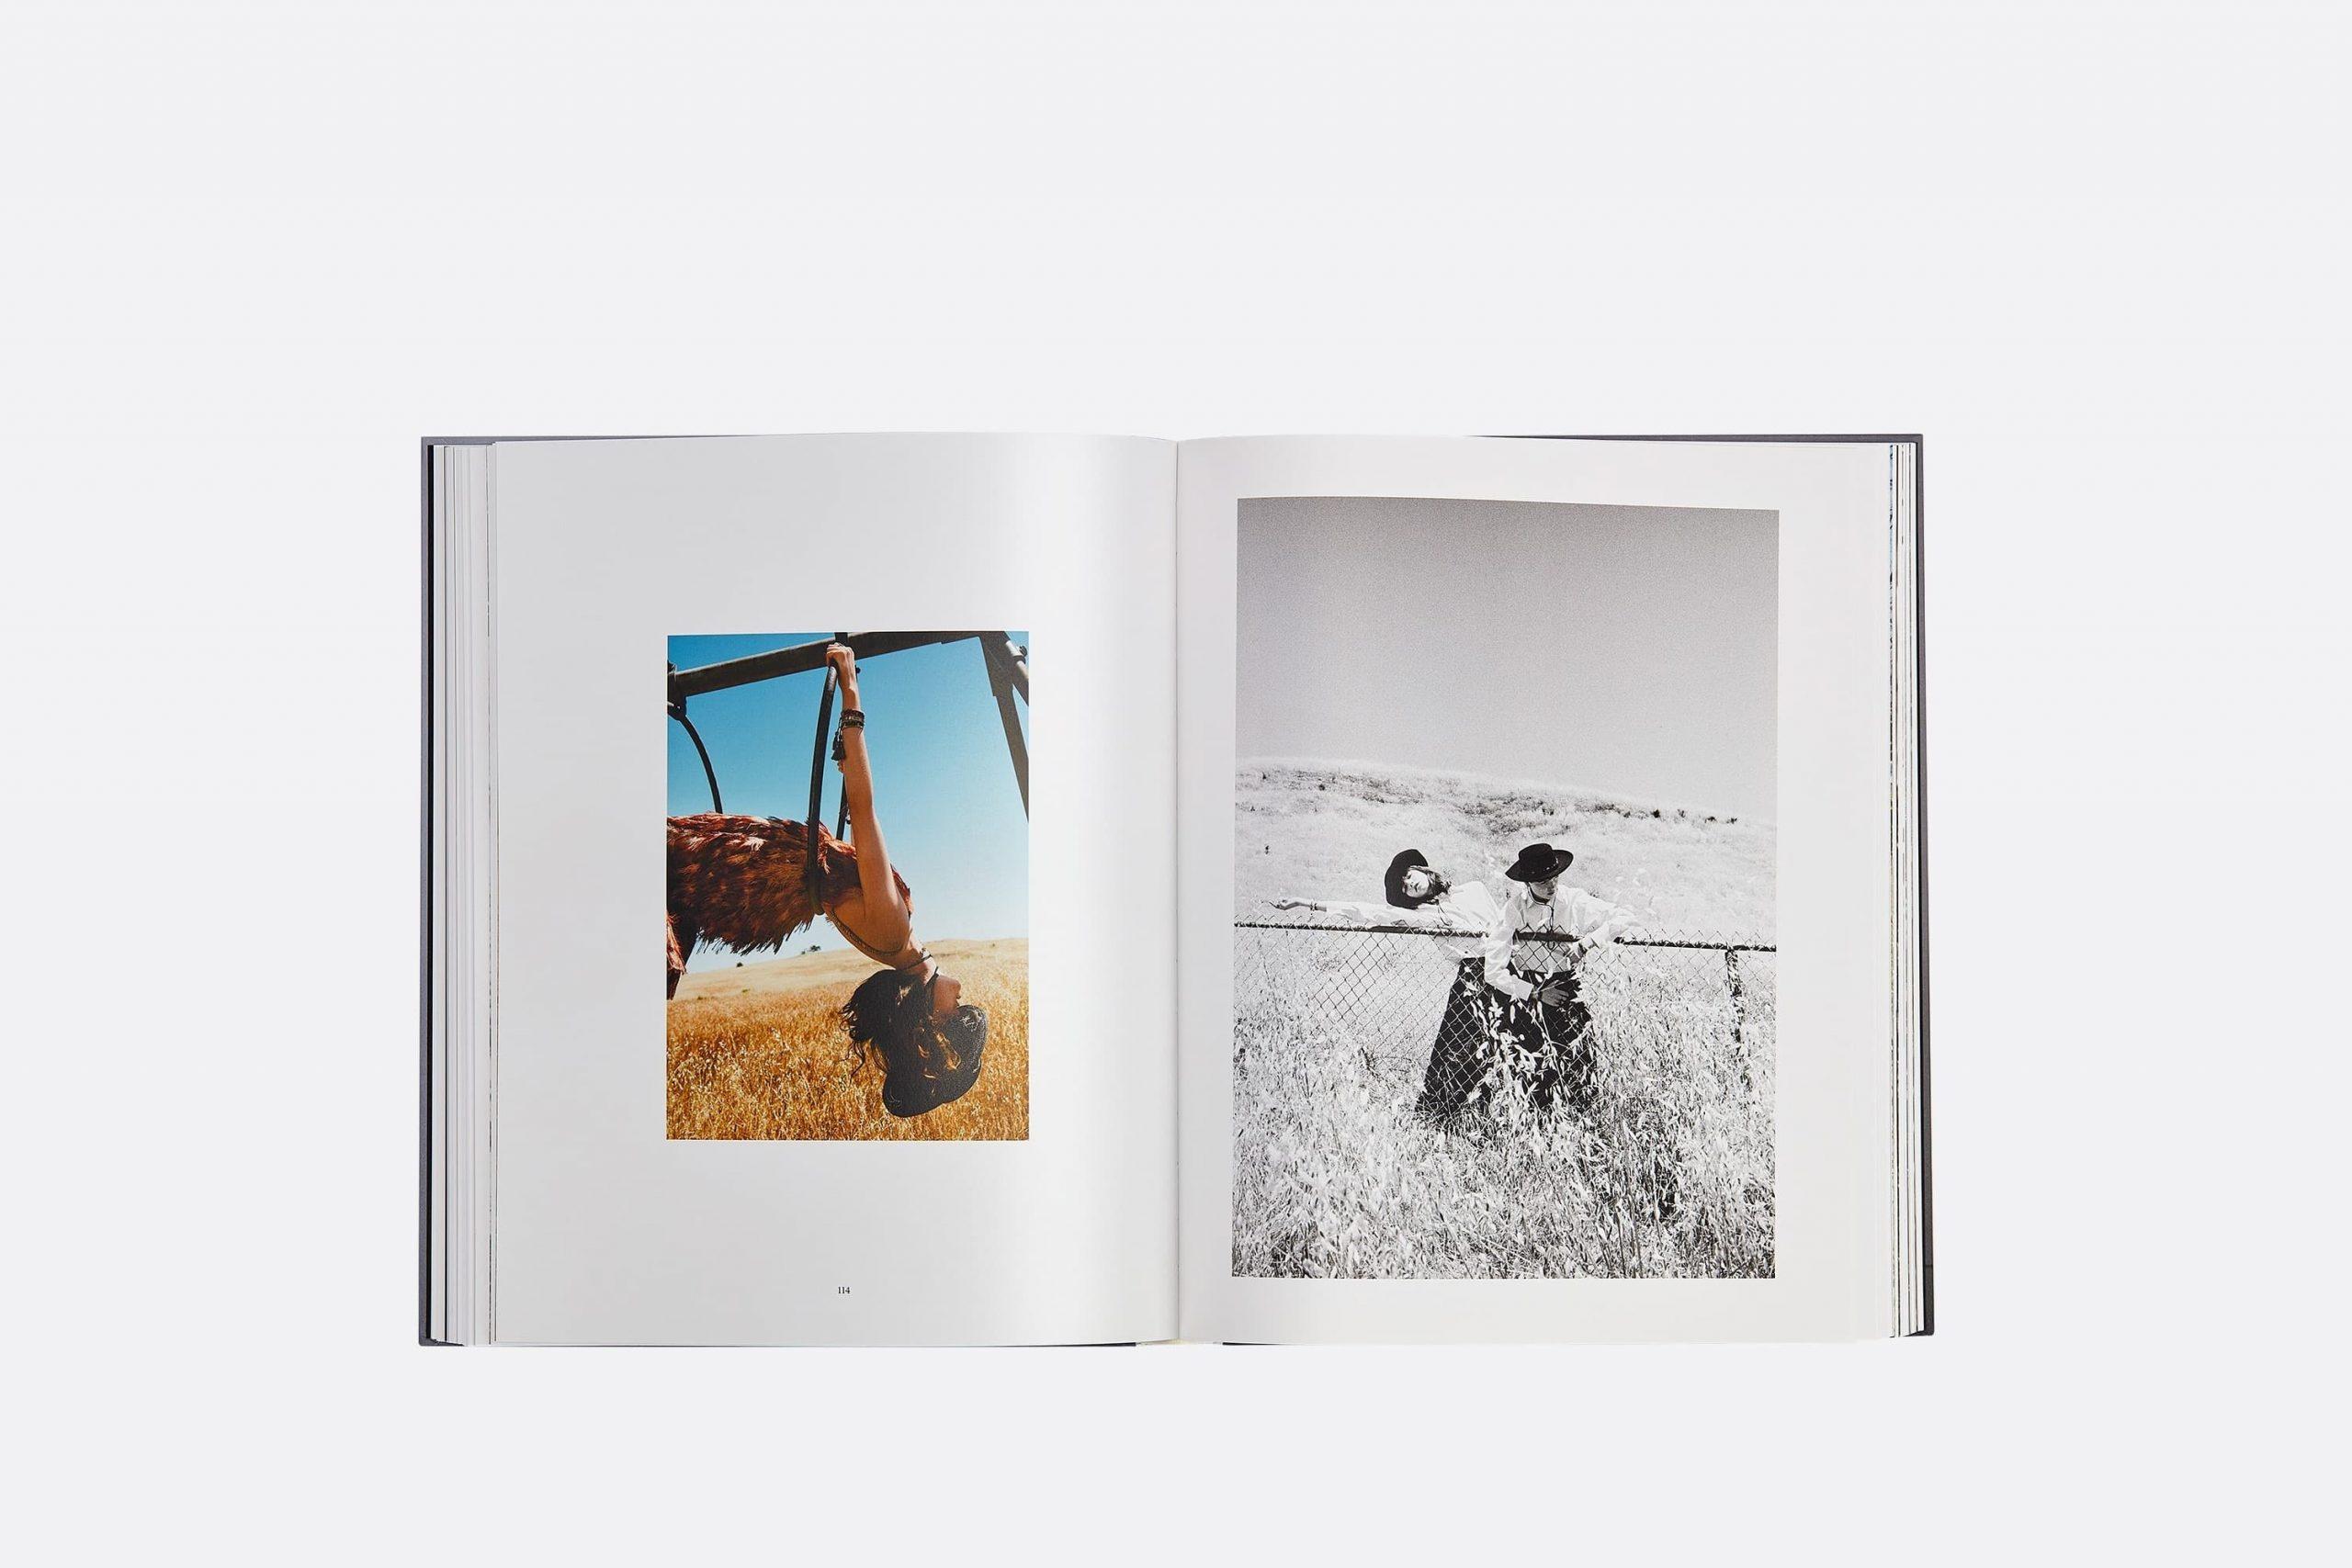 Maria Grazia Chiuri's New 'Her Dior' Book